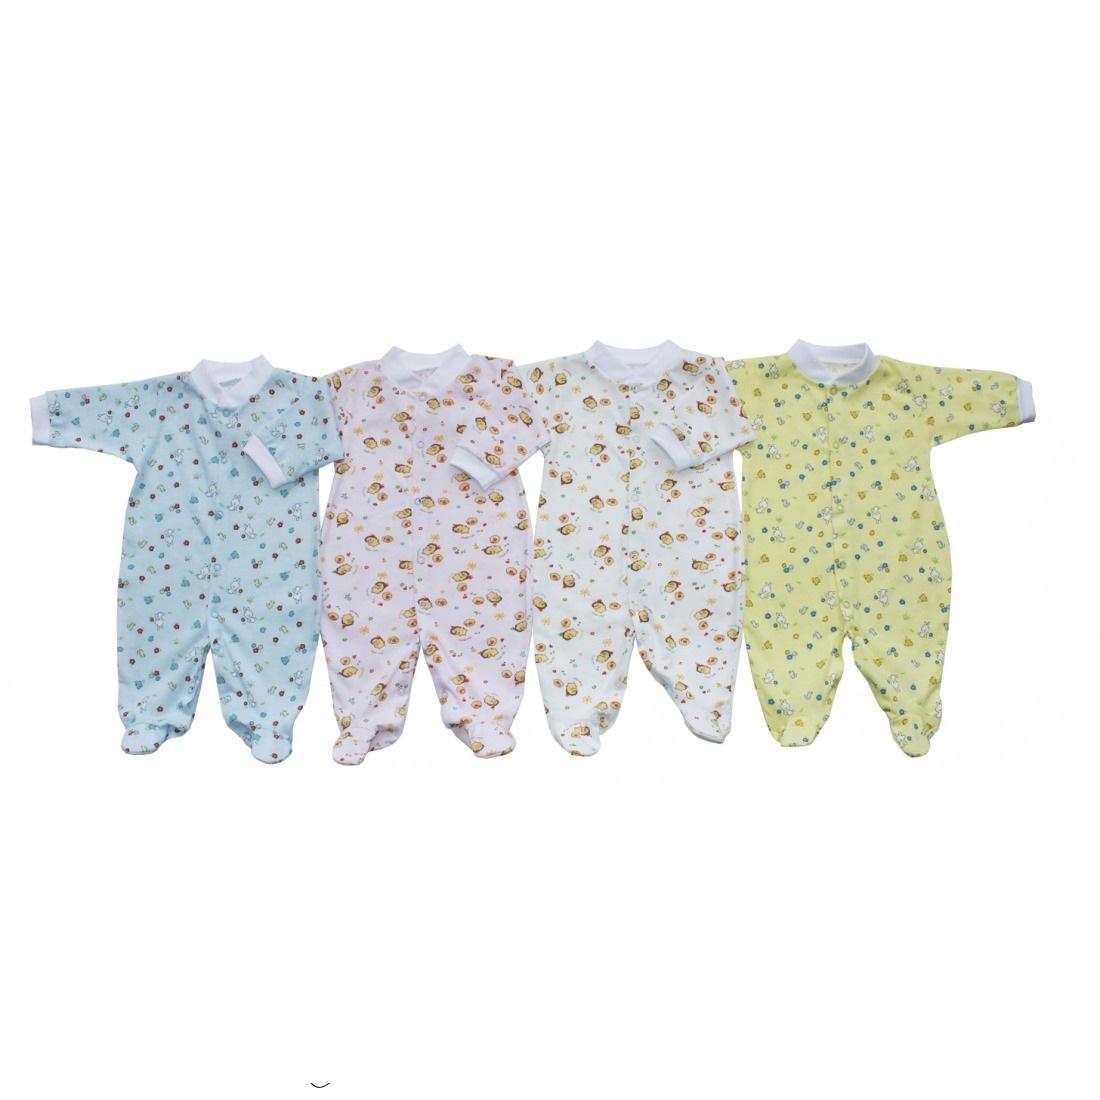 Комбинезон детский МилашкаКомбинезоны и полукомбинезоны<br><br><br>Размер: Белый